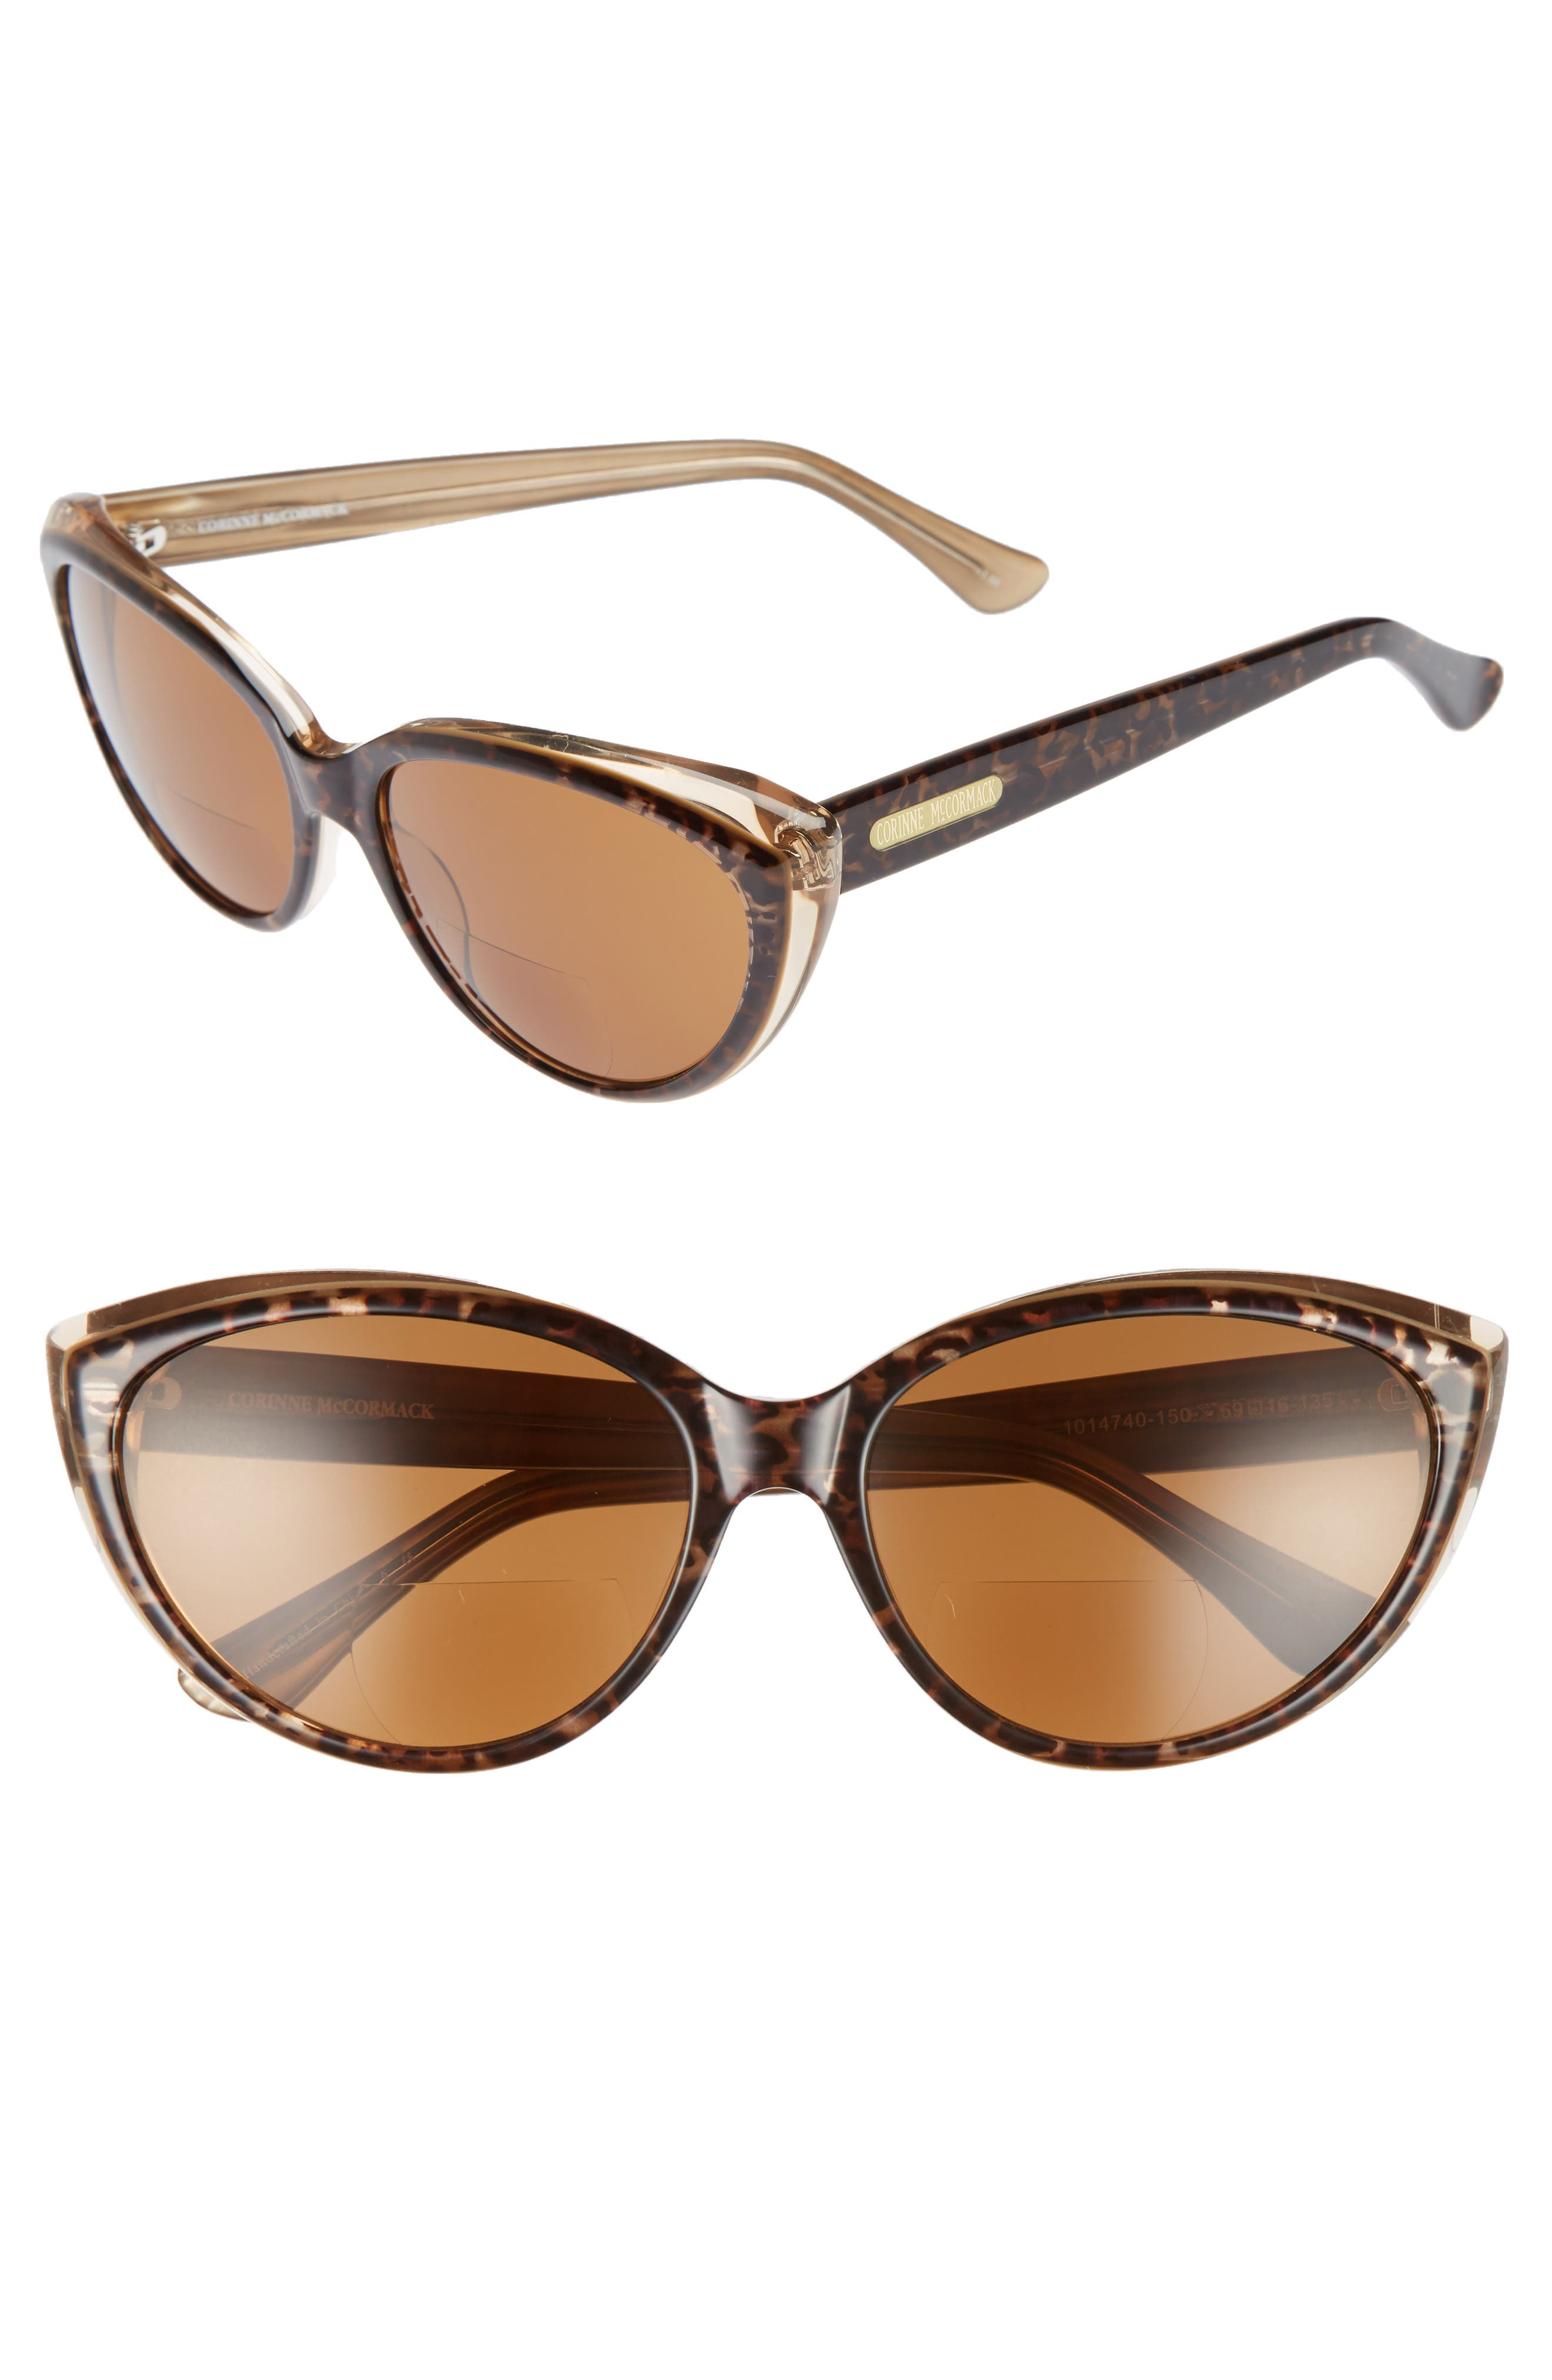 Corrine McCormack Anita 59mm Reading Sunglasses,                             Main thumbnail 1, color,                             DARK LEOPARD